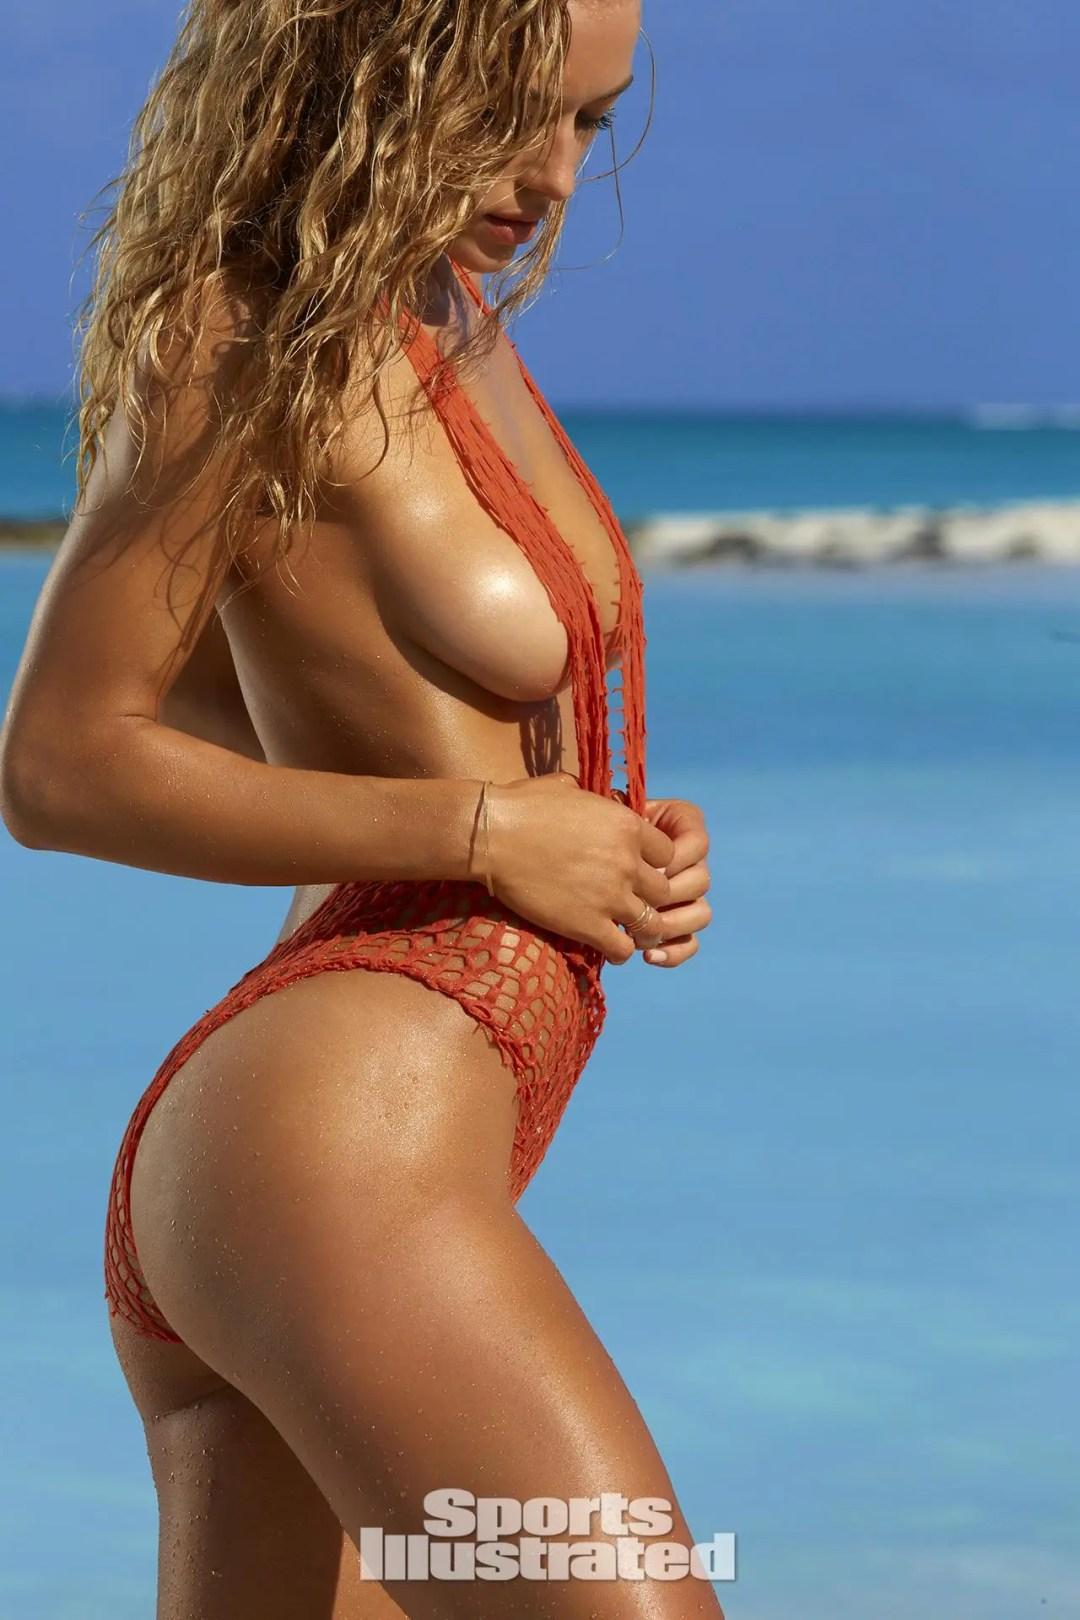 hannah-ferguson-2016-sexy-nude-photo-sports-illustrated 3